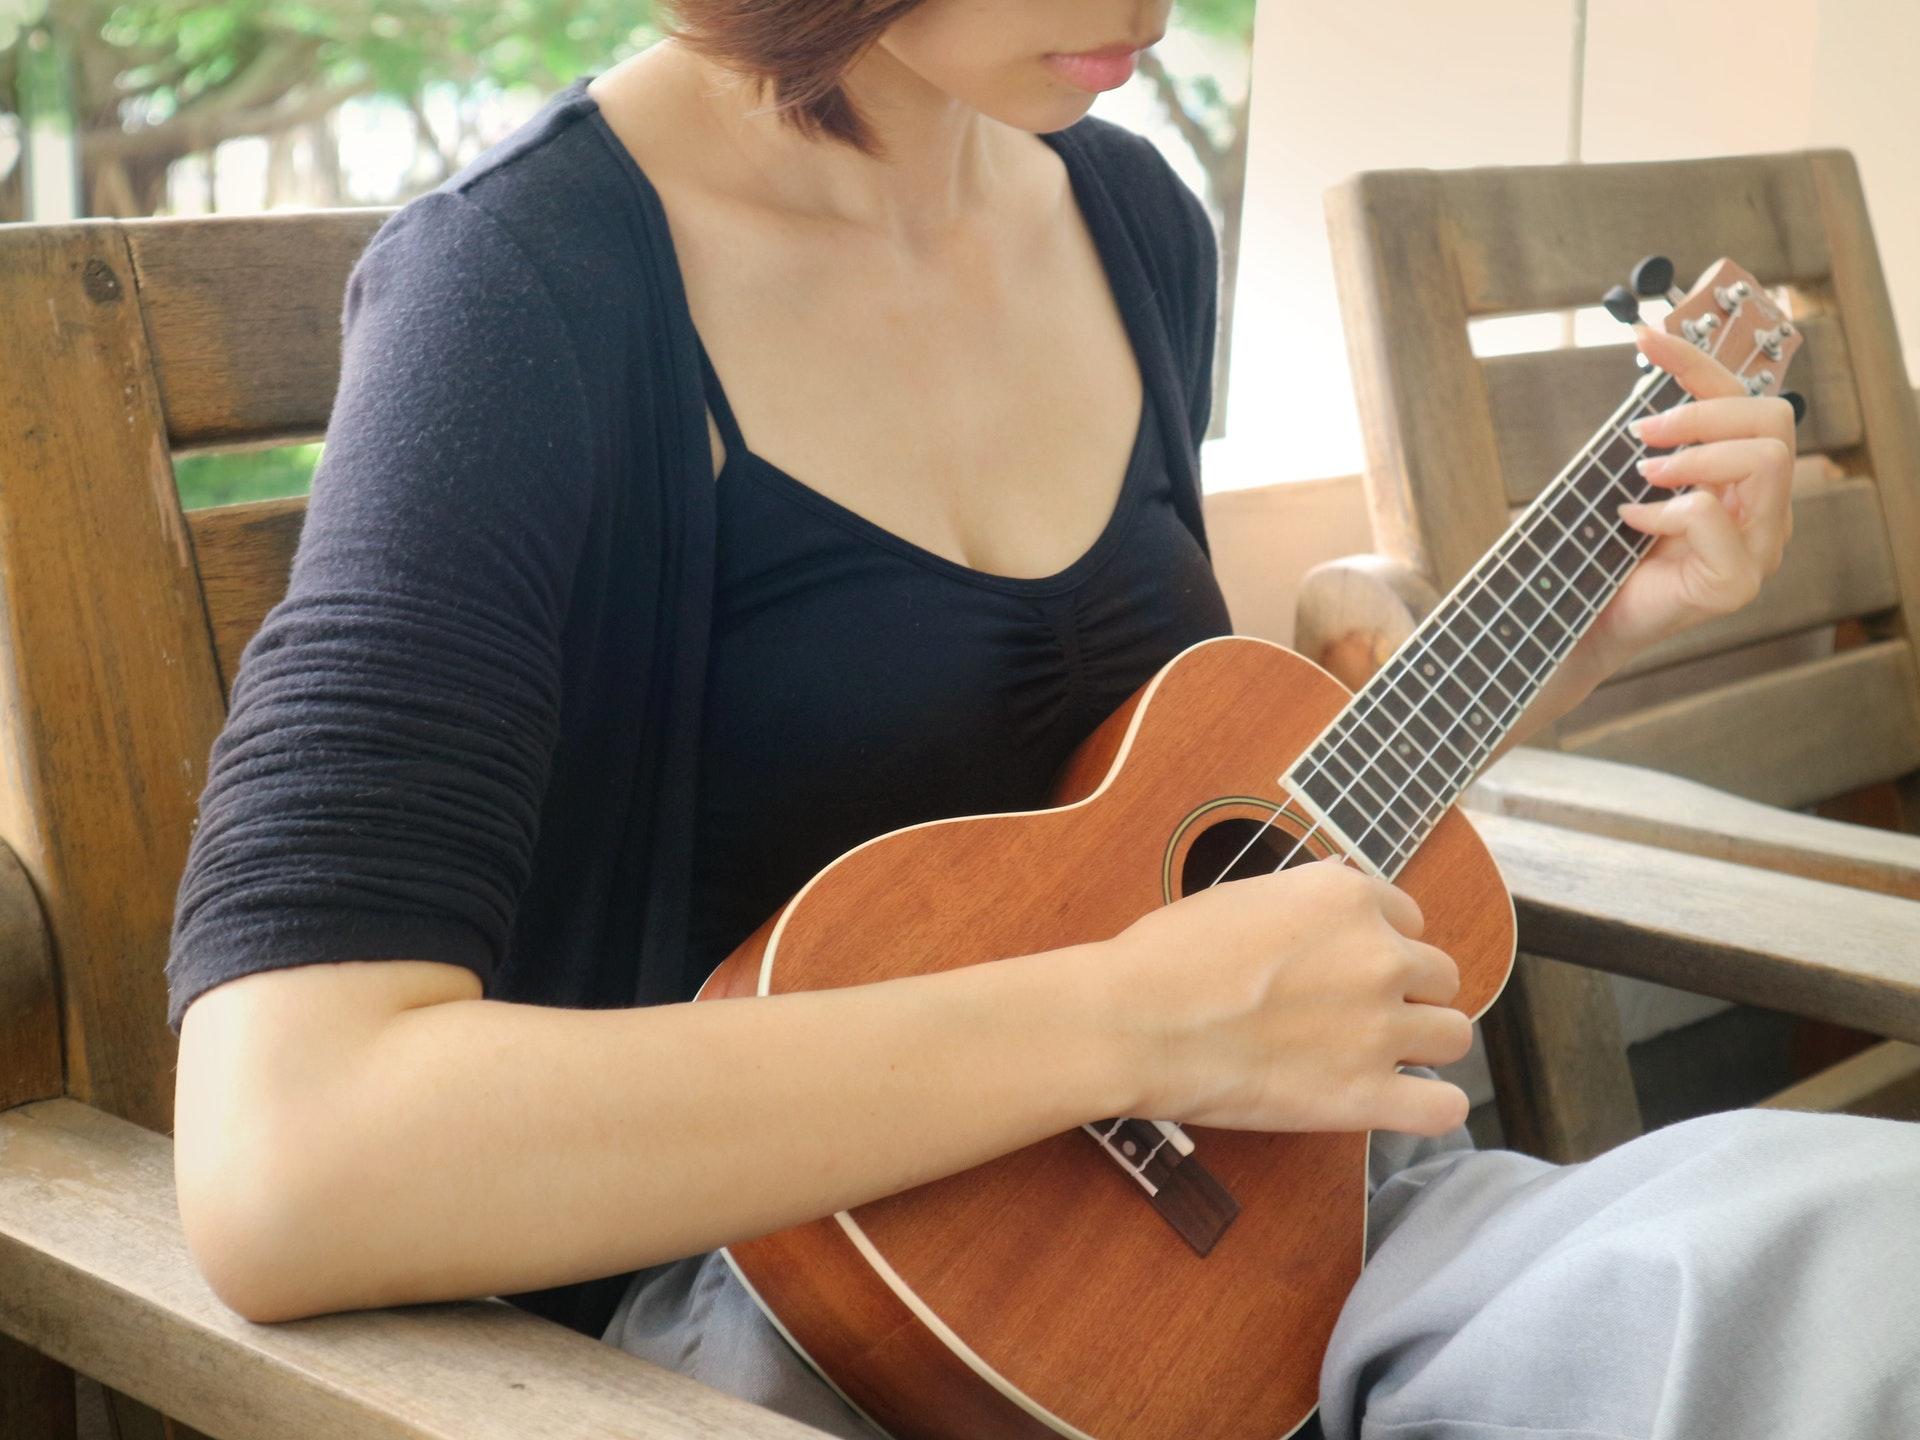 arte allegro - acordes - escalas - ukelele - escuela de musica online